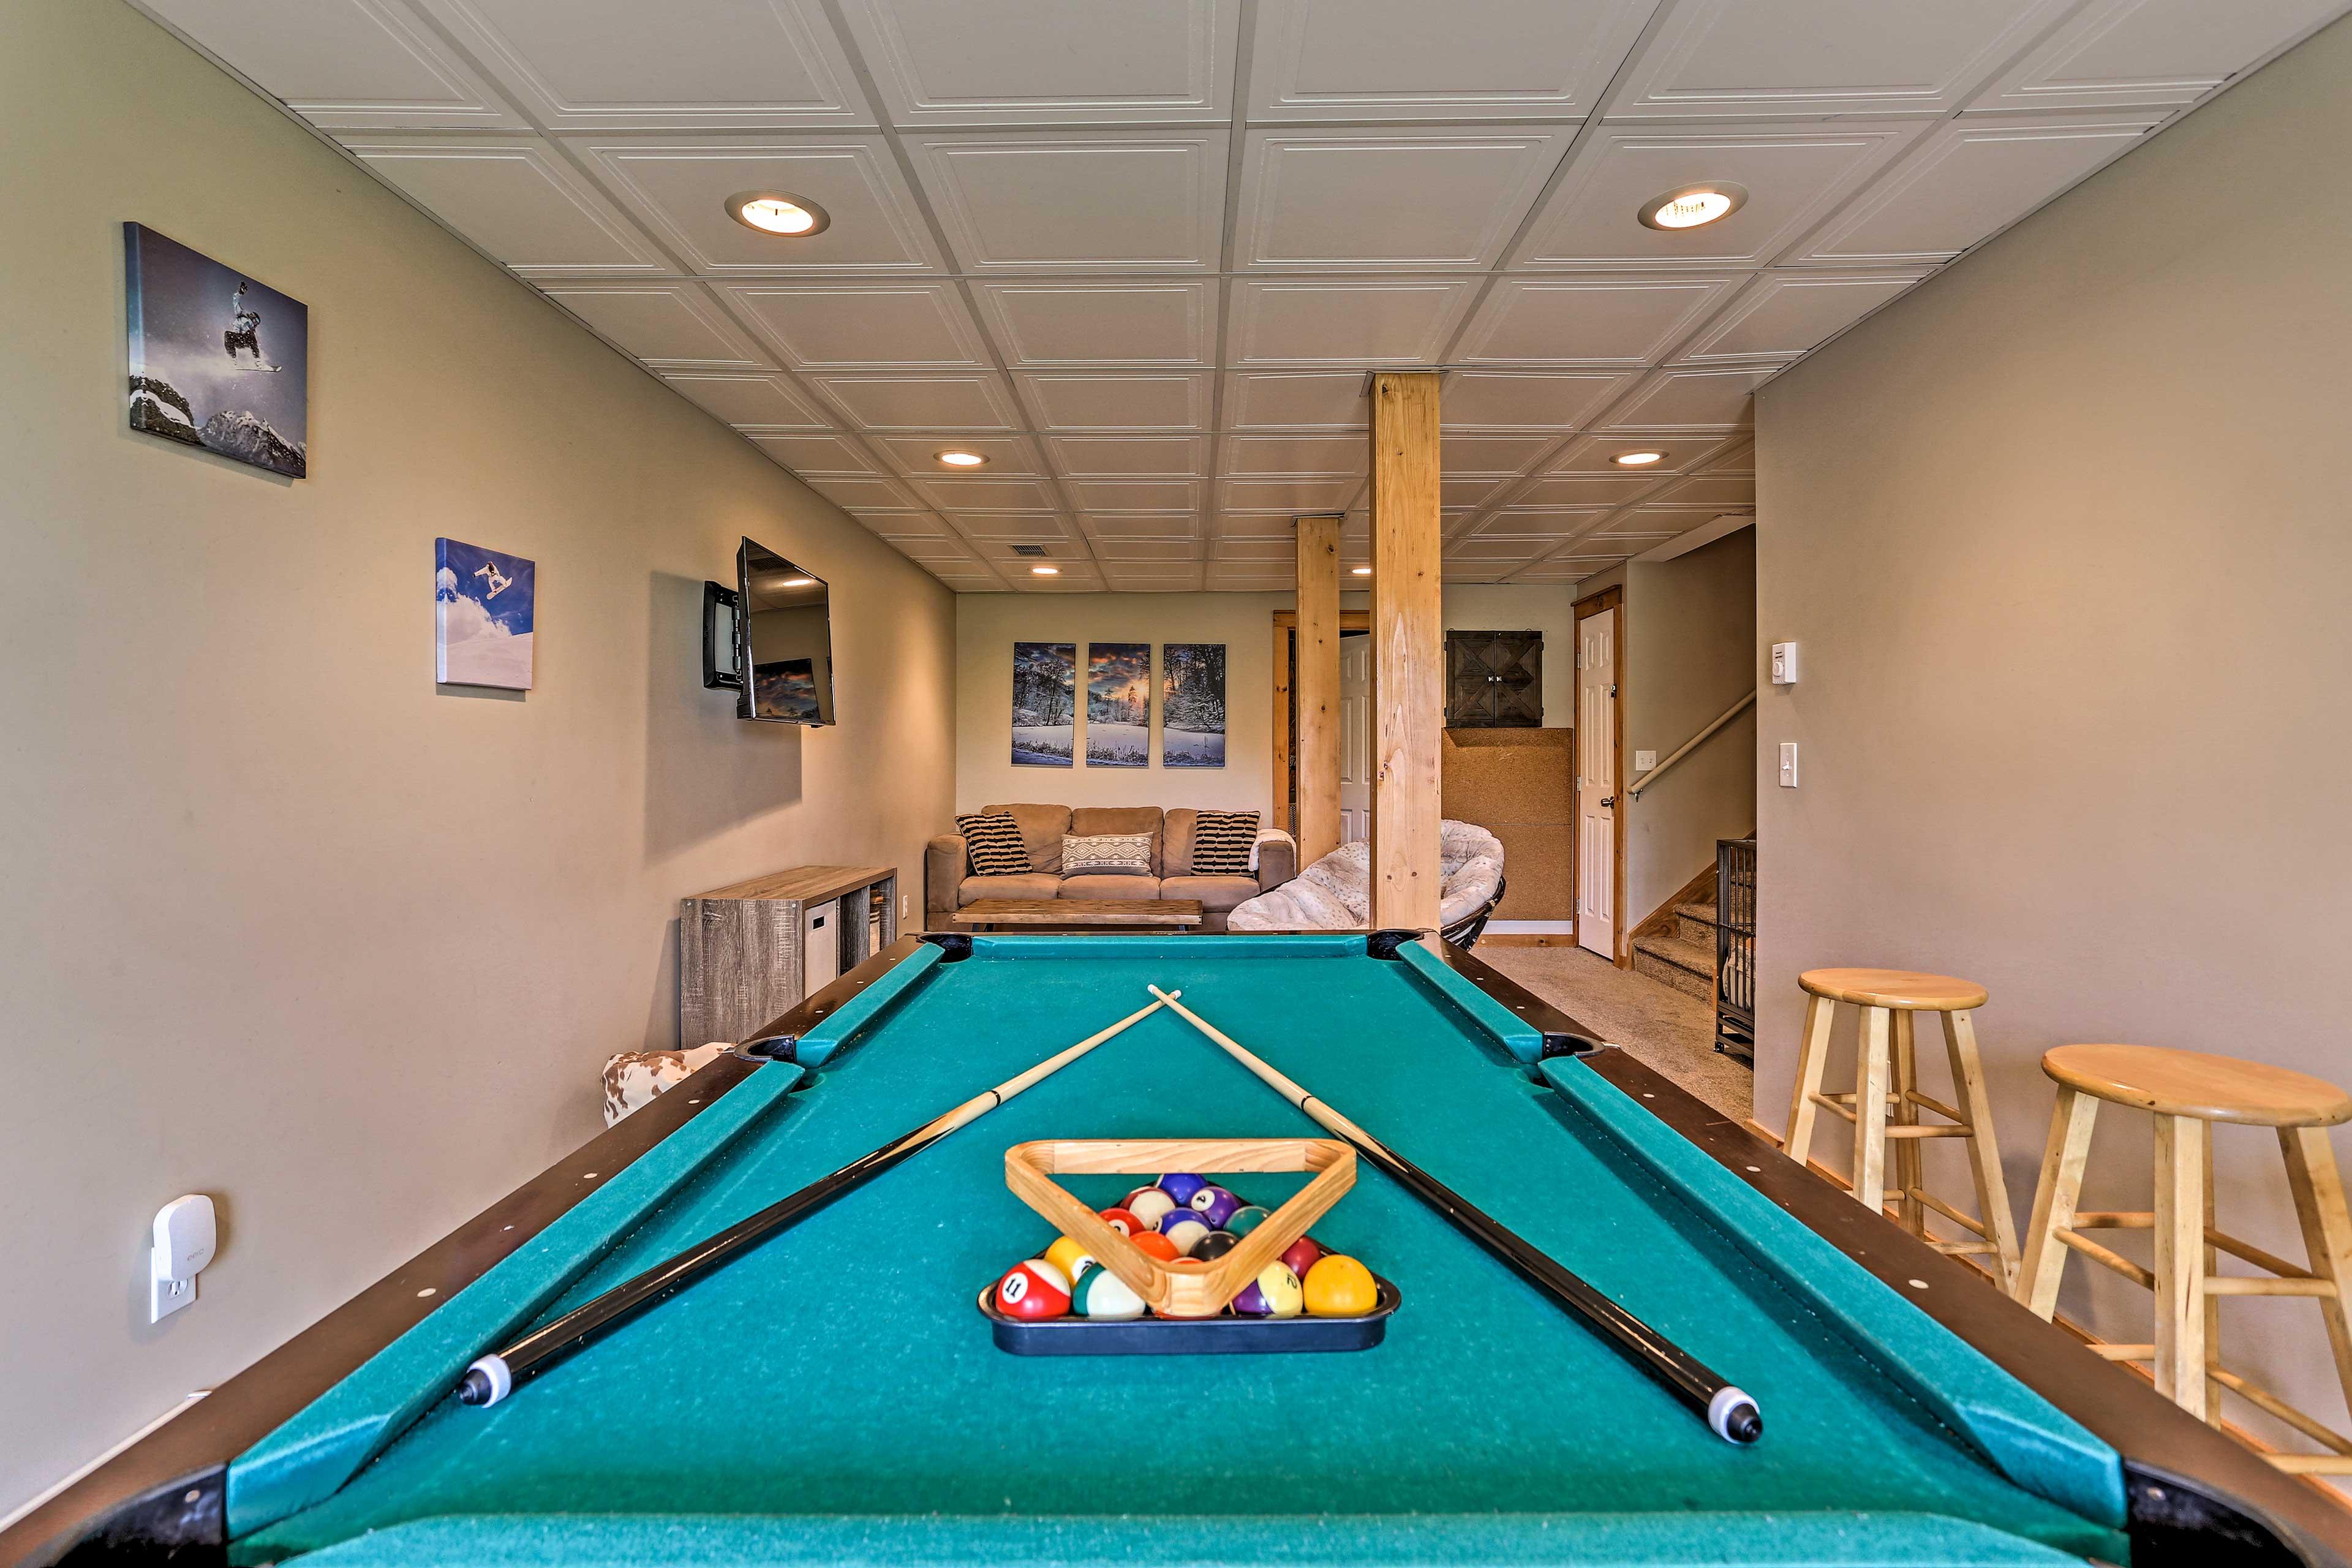 Game Room   Pool Table   Board Games   Dart Board